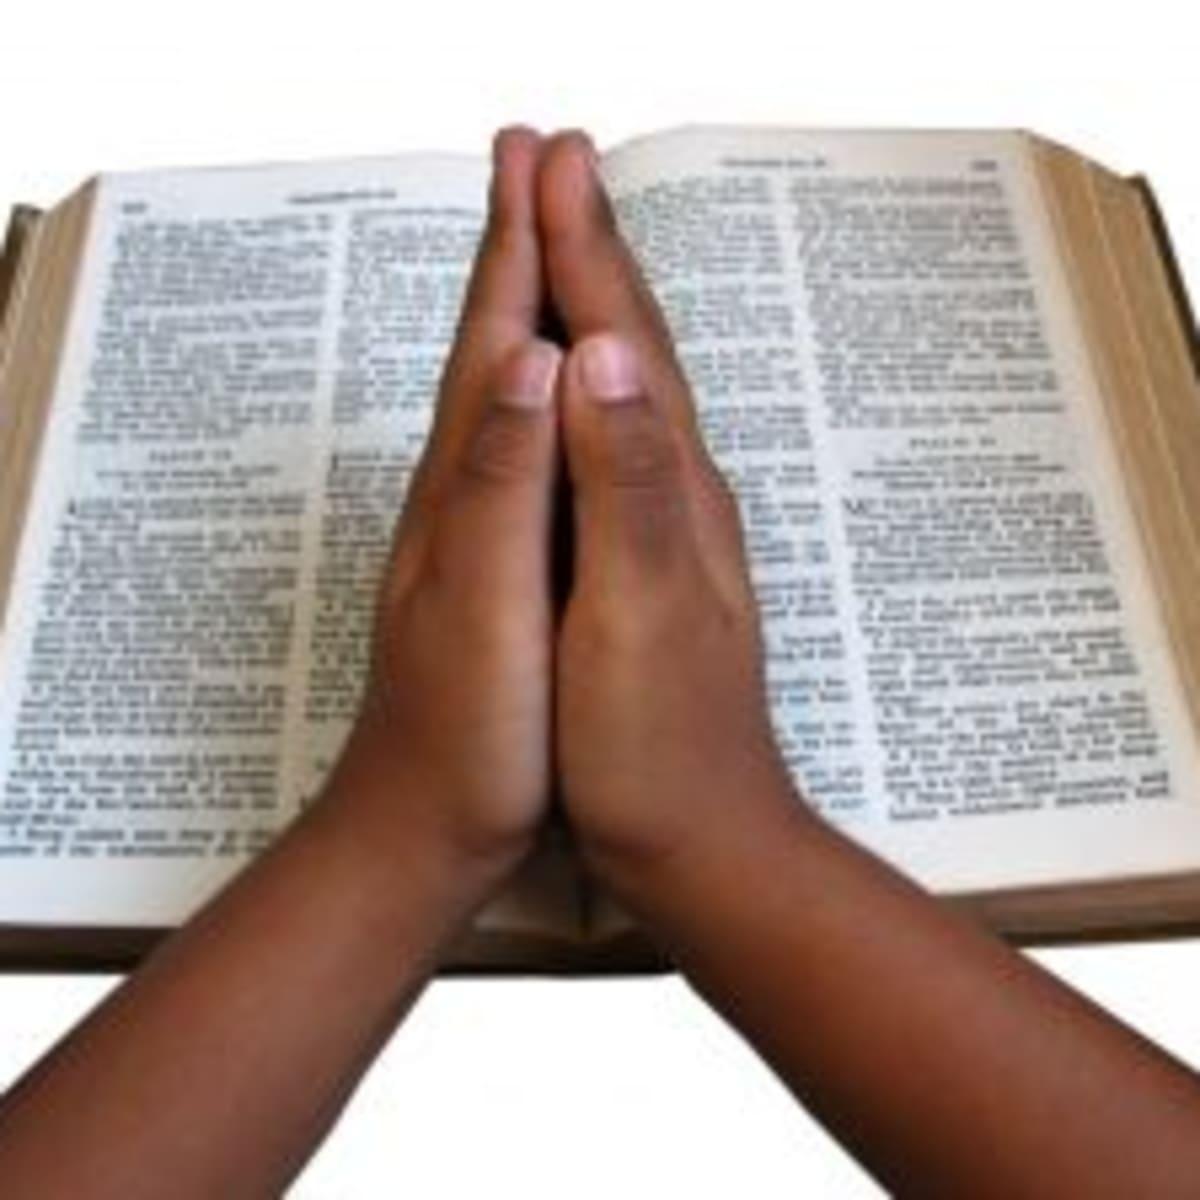 hight resolution of KJV Version Sunday School Lessons: Fruit of the Spirit Elementary Lesson  Ideas for Children - HubPages